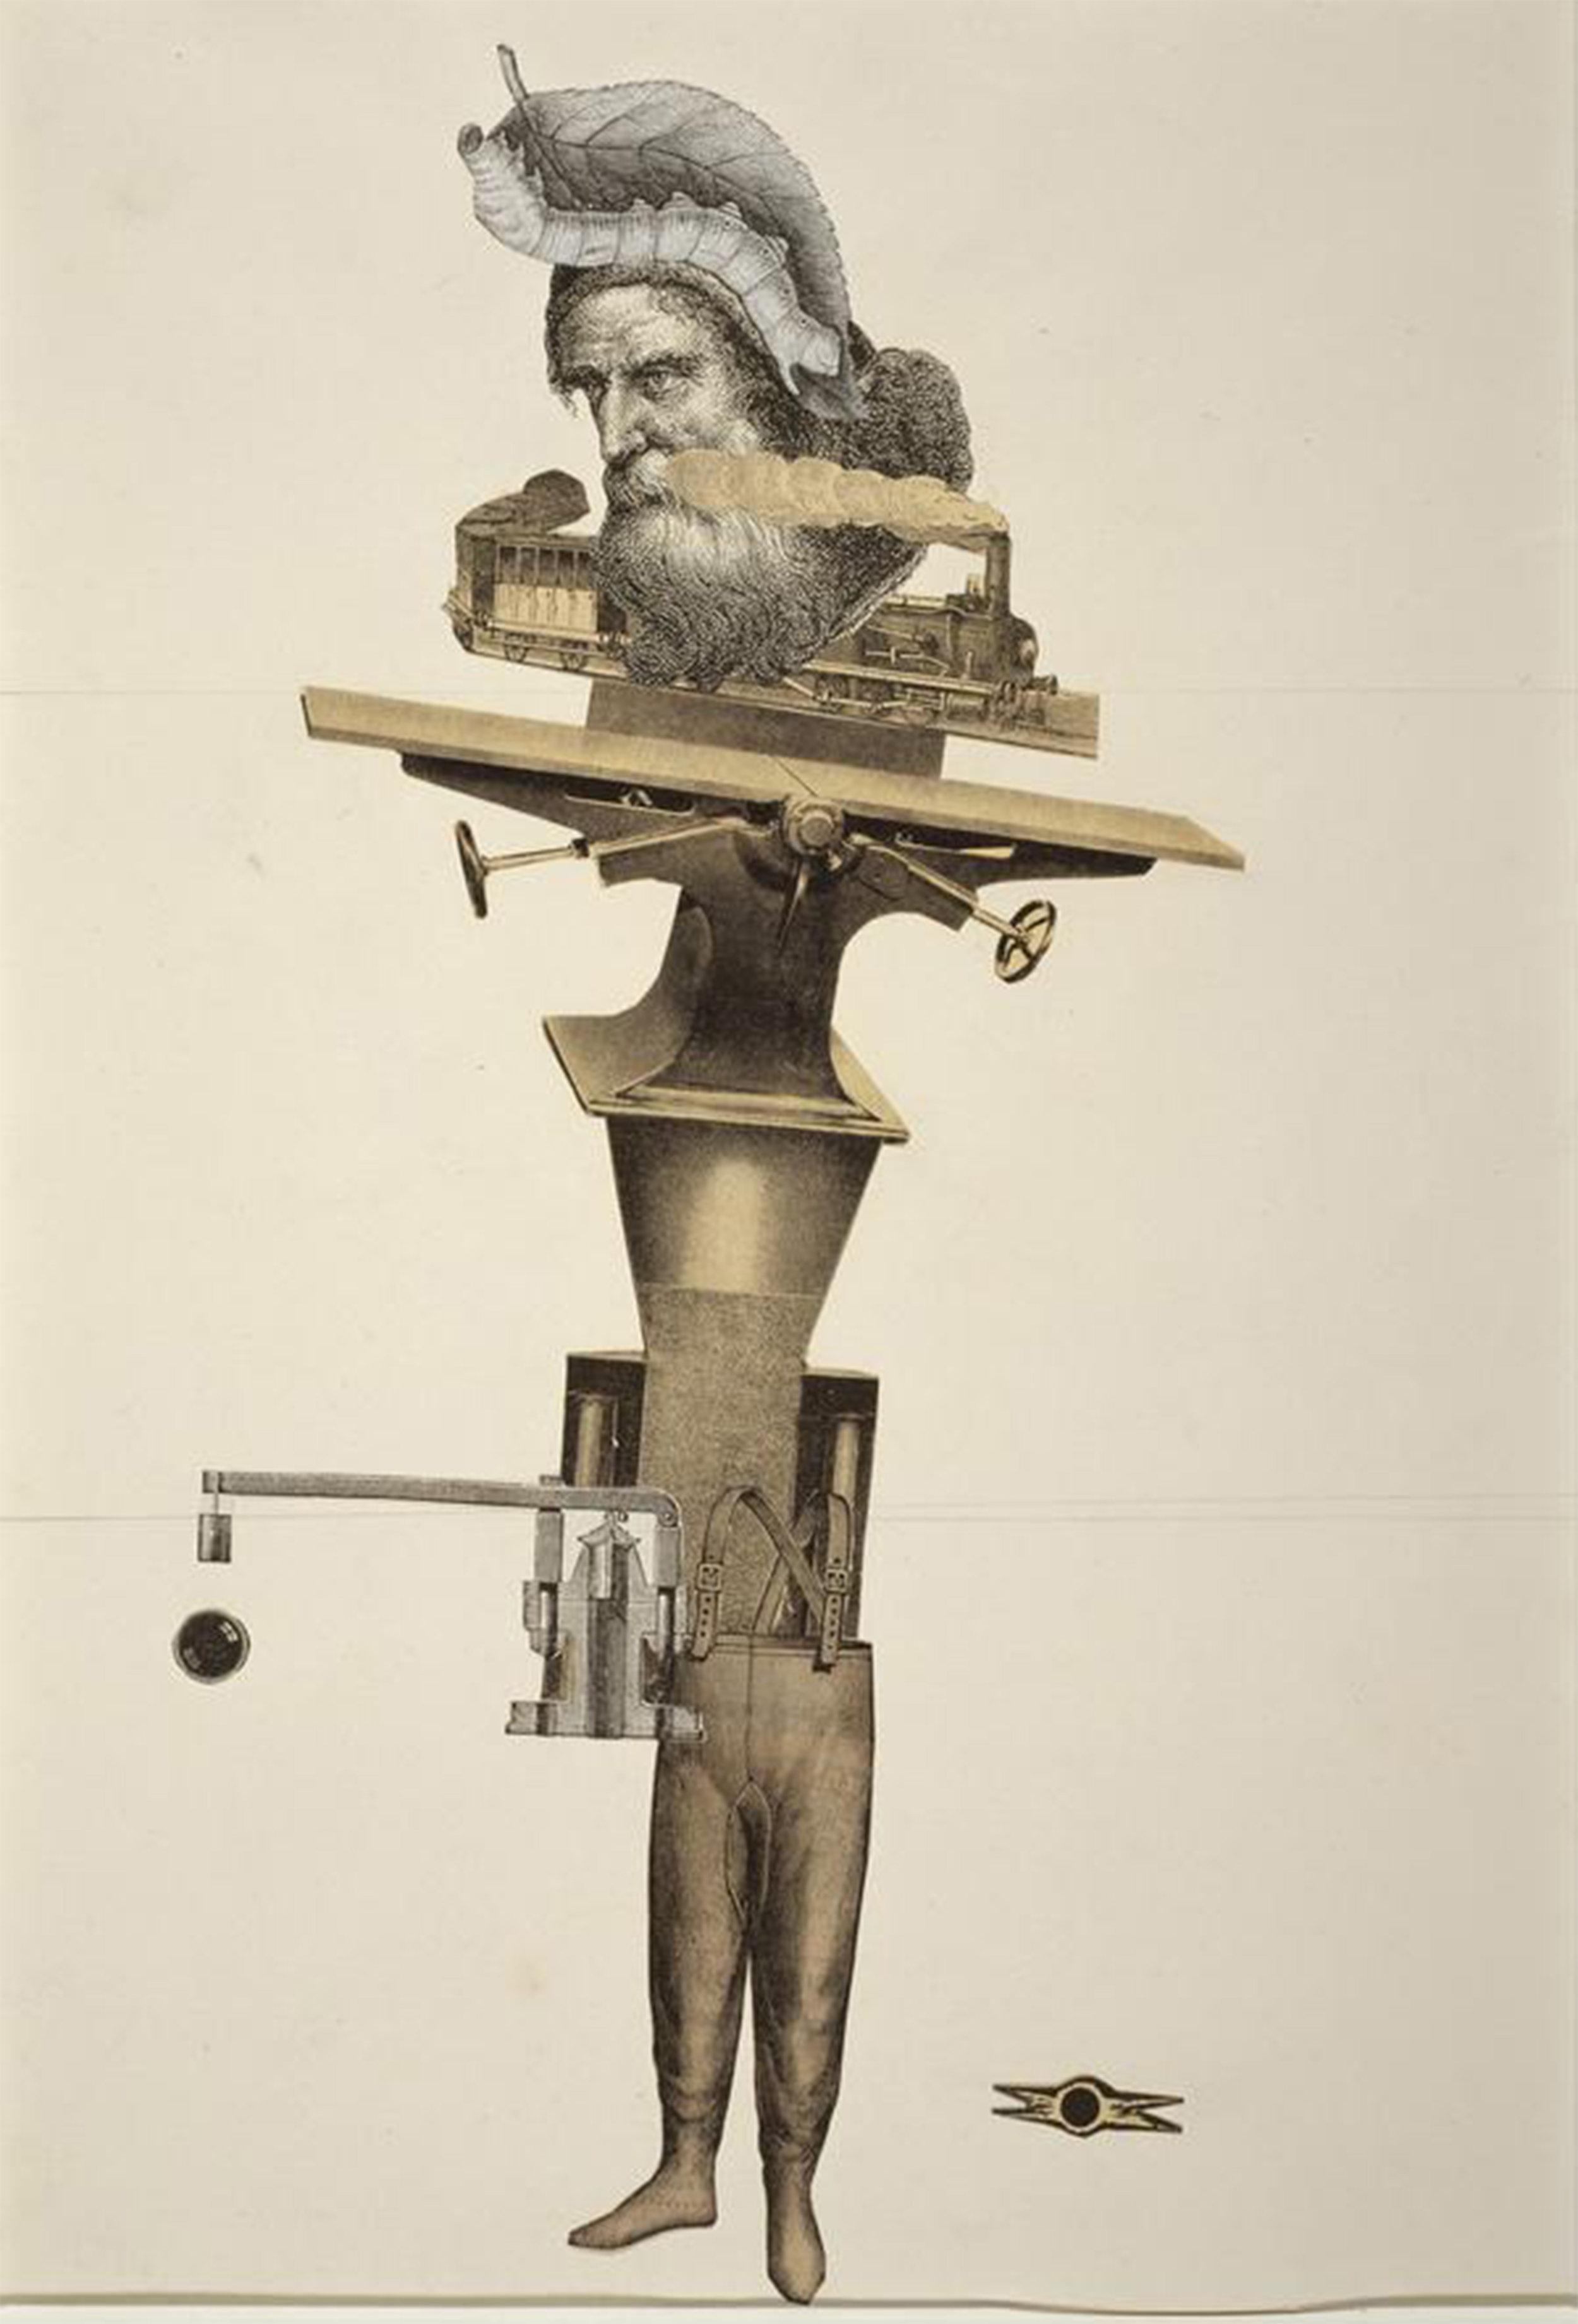 Exquisite corpse by Andre Breton et al: Main à Plume or origins of the alt-right?